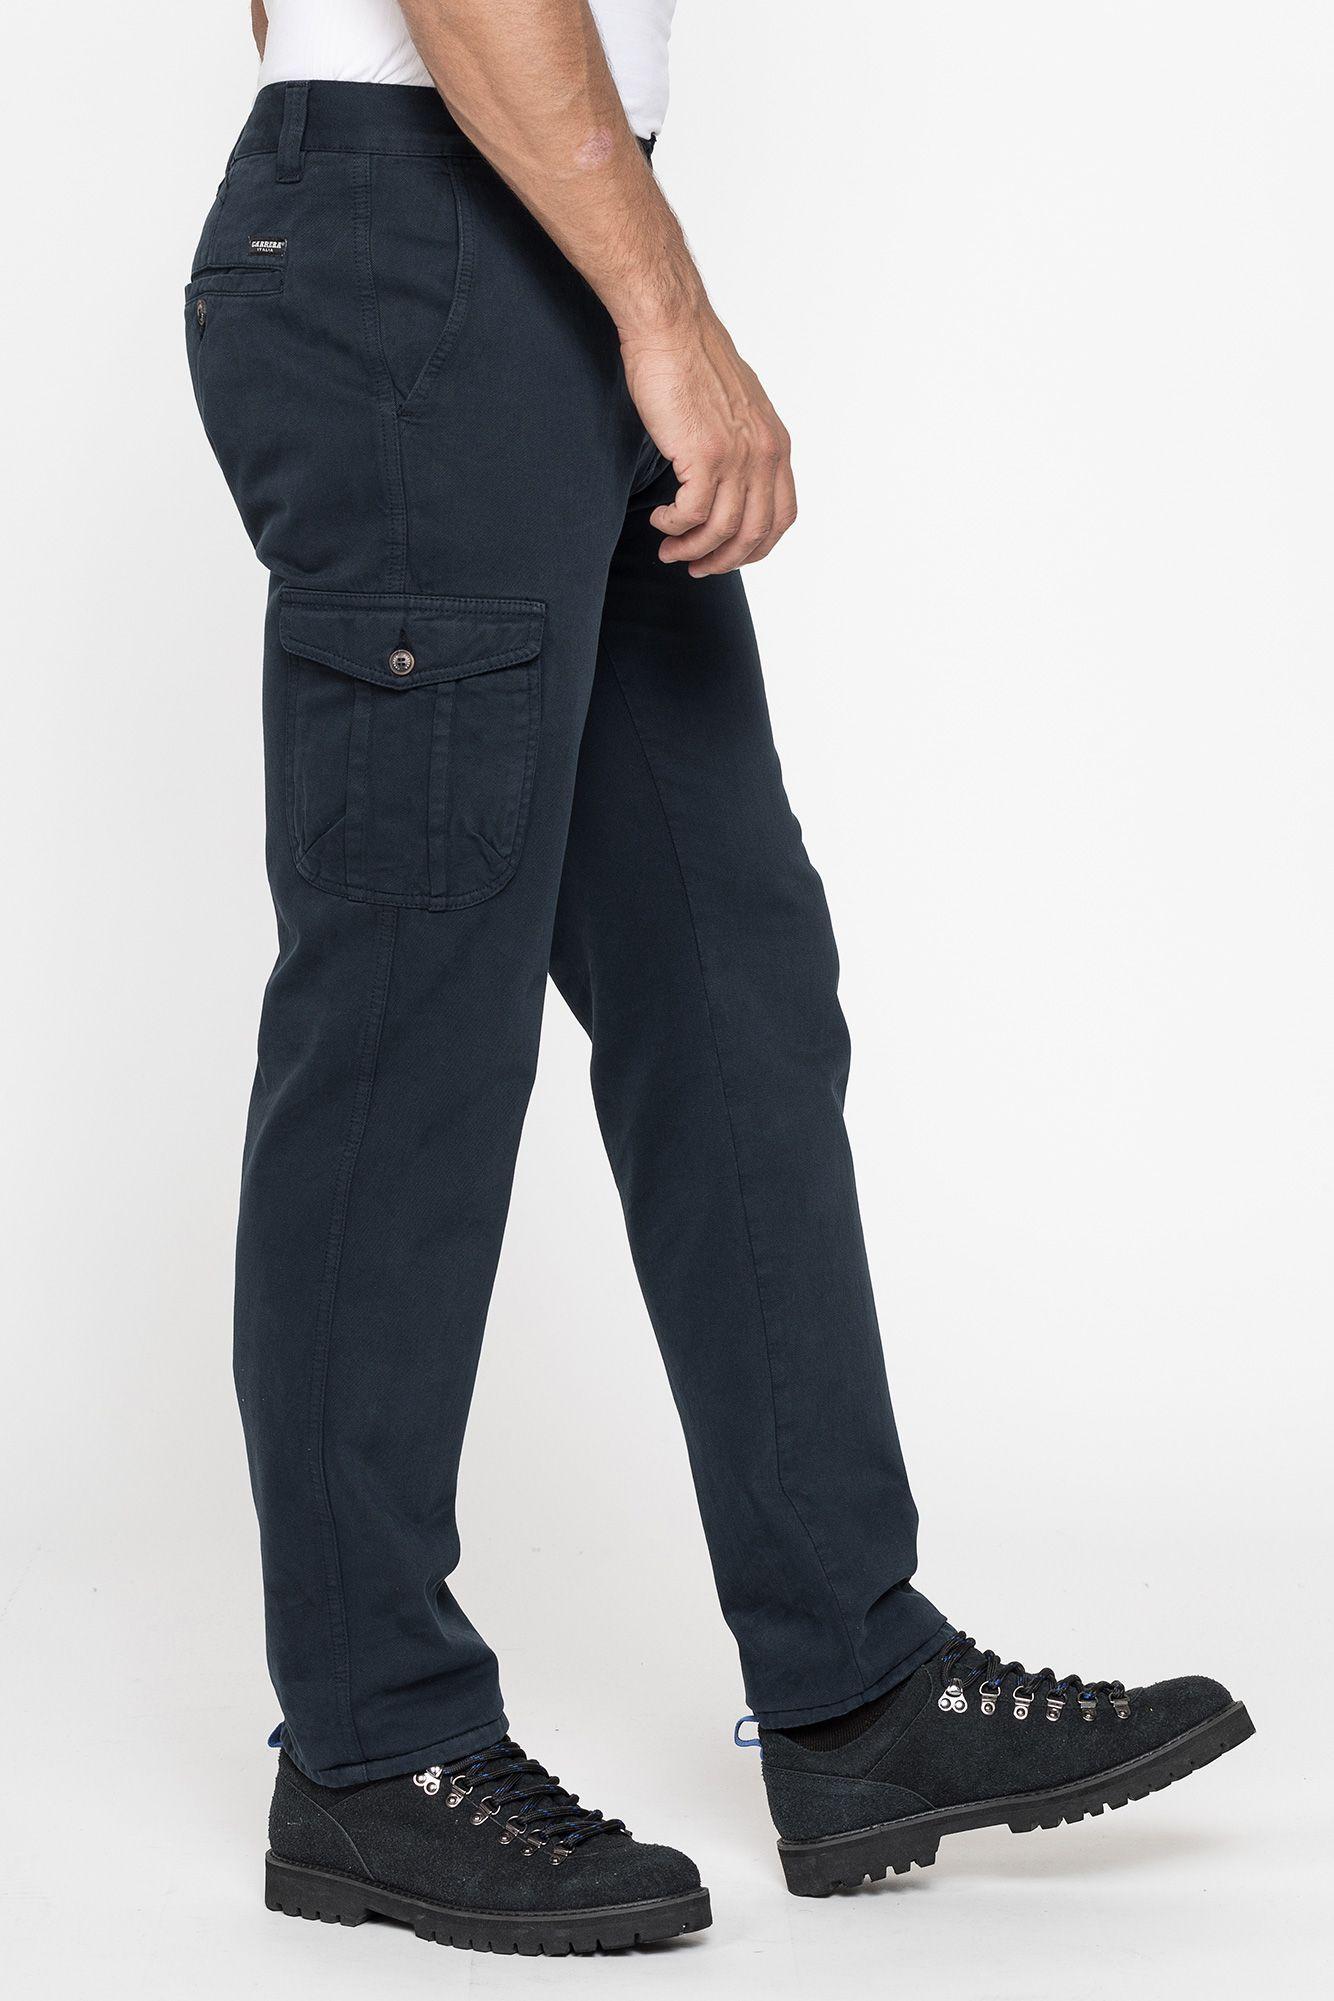 Carrera Pantalone Uomo Regular Cotone Invernale Cargo Tasconi Art.619